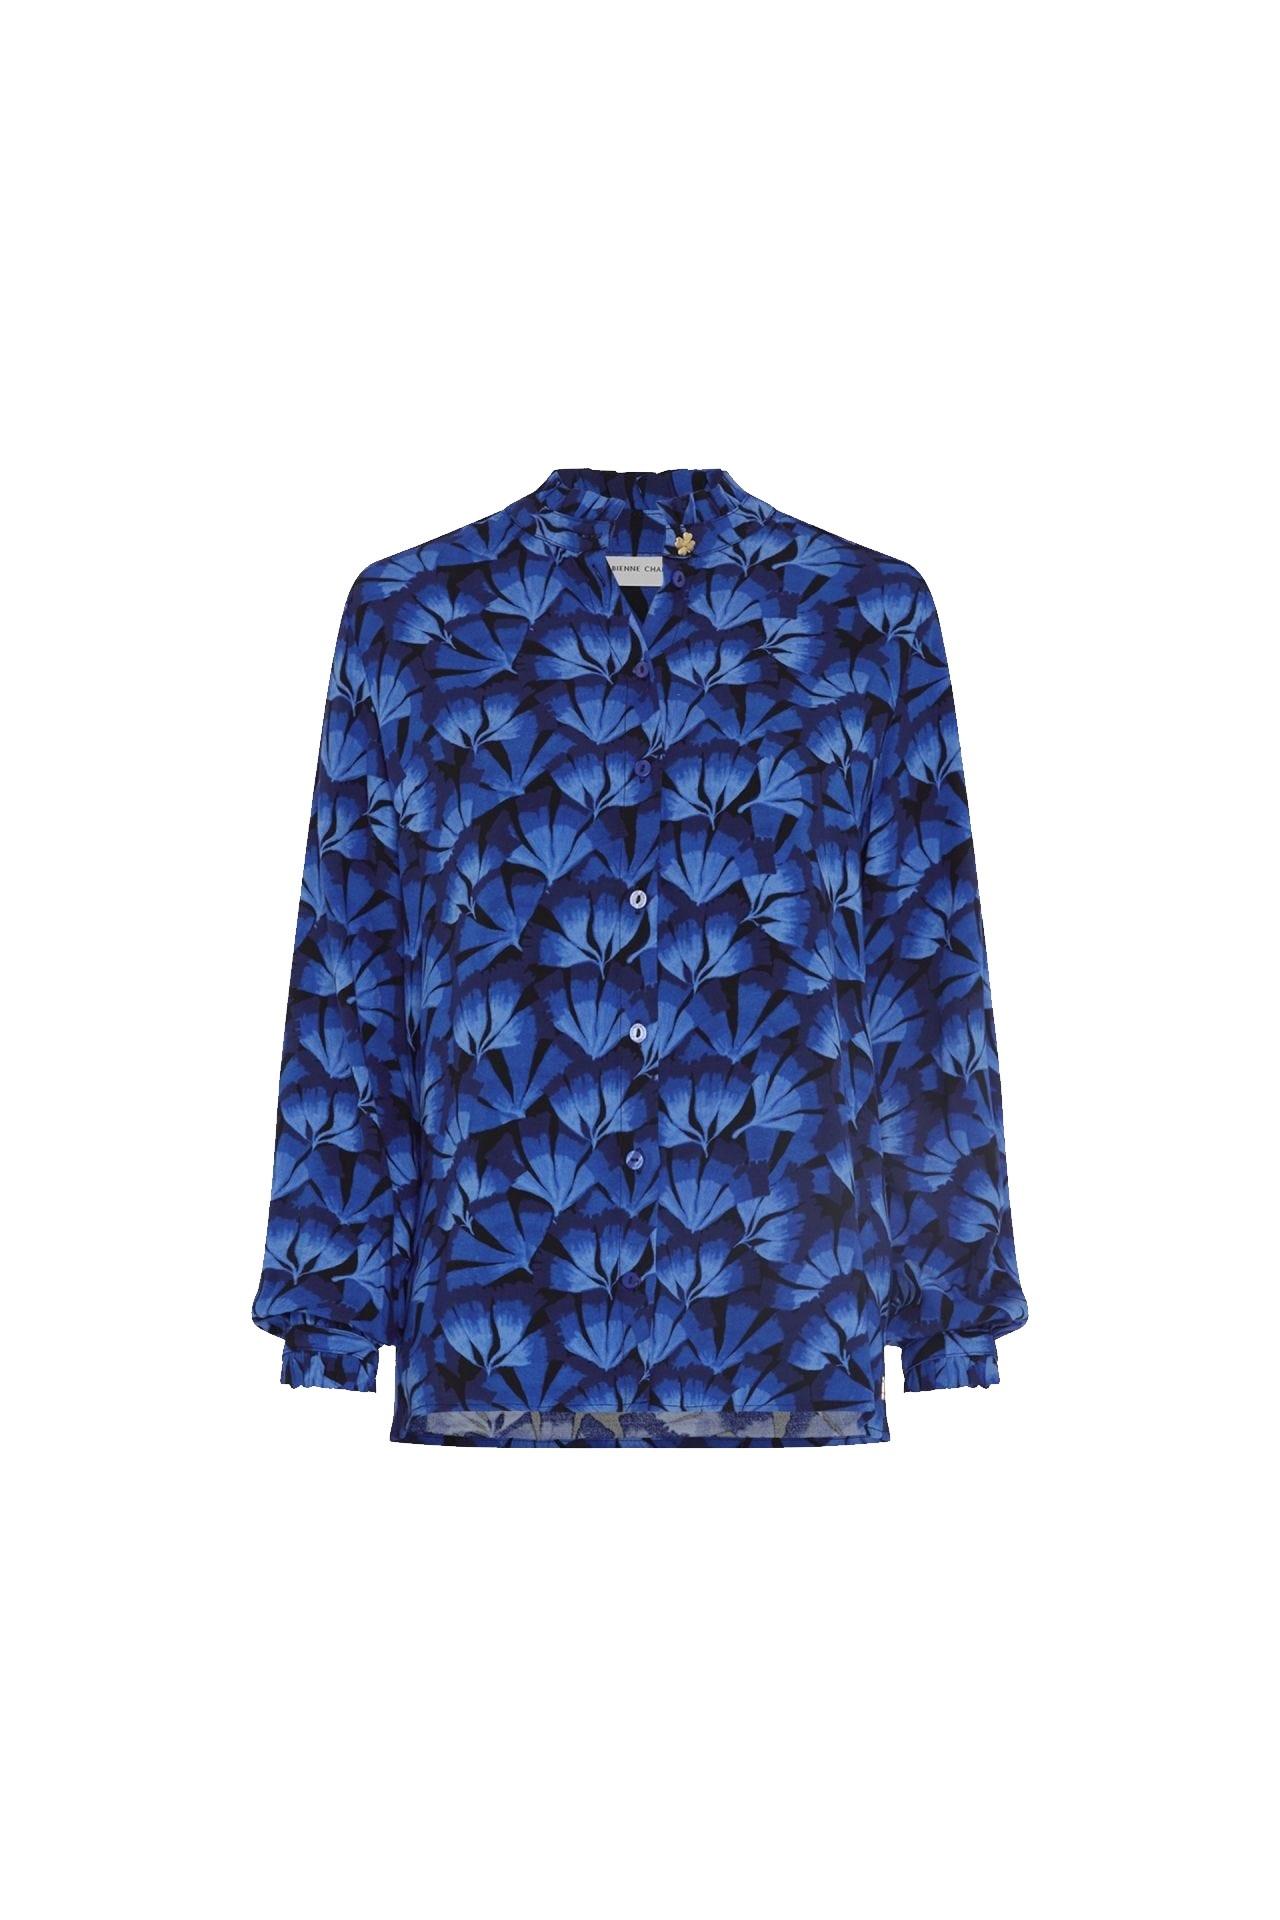 Zwart/blauwe dames blouse Fabienne Chapot - Garden Blouse black/kobalt